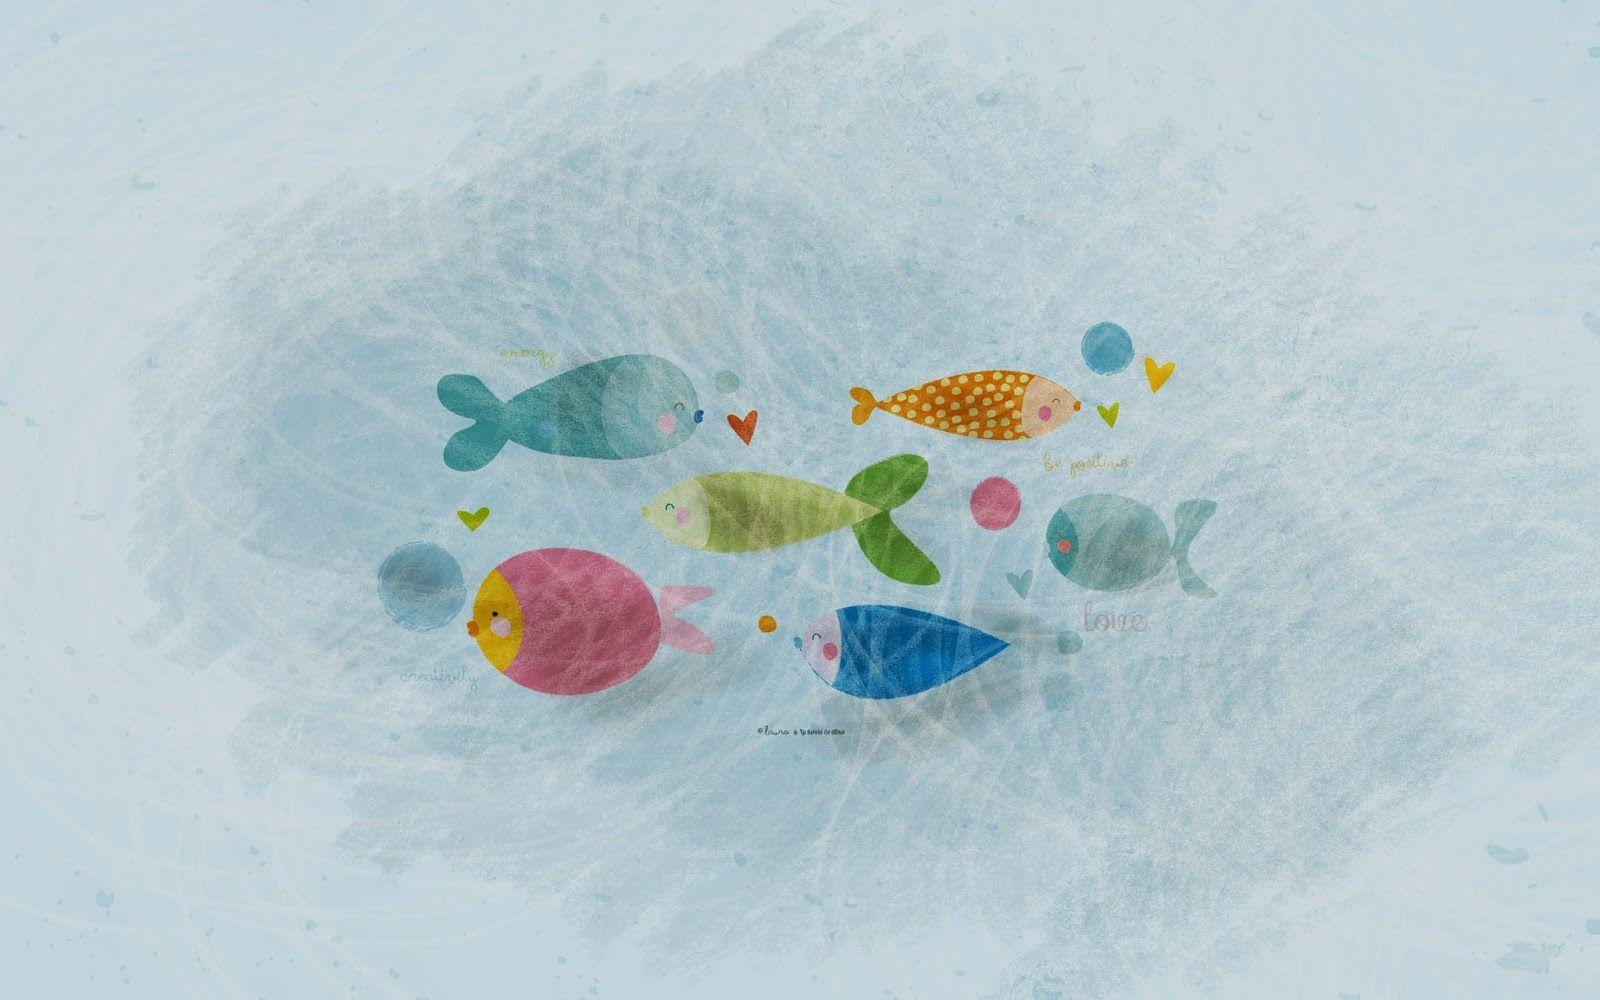 Fondos De Escritorio Gratis: Colorfull Little Fishes Desktop Wallpaper #freebie